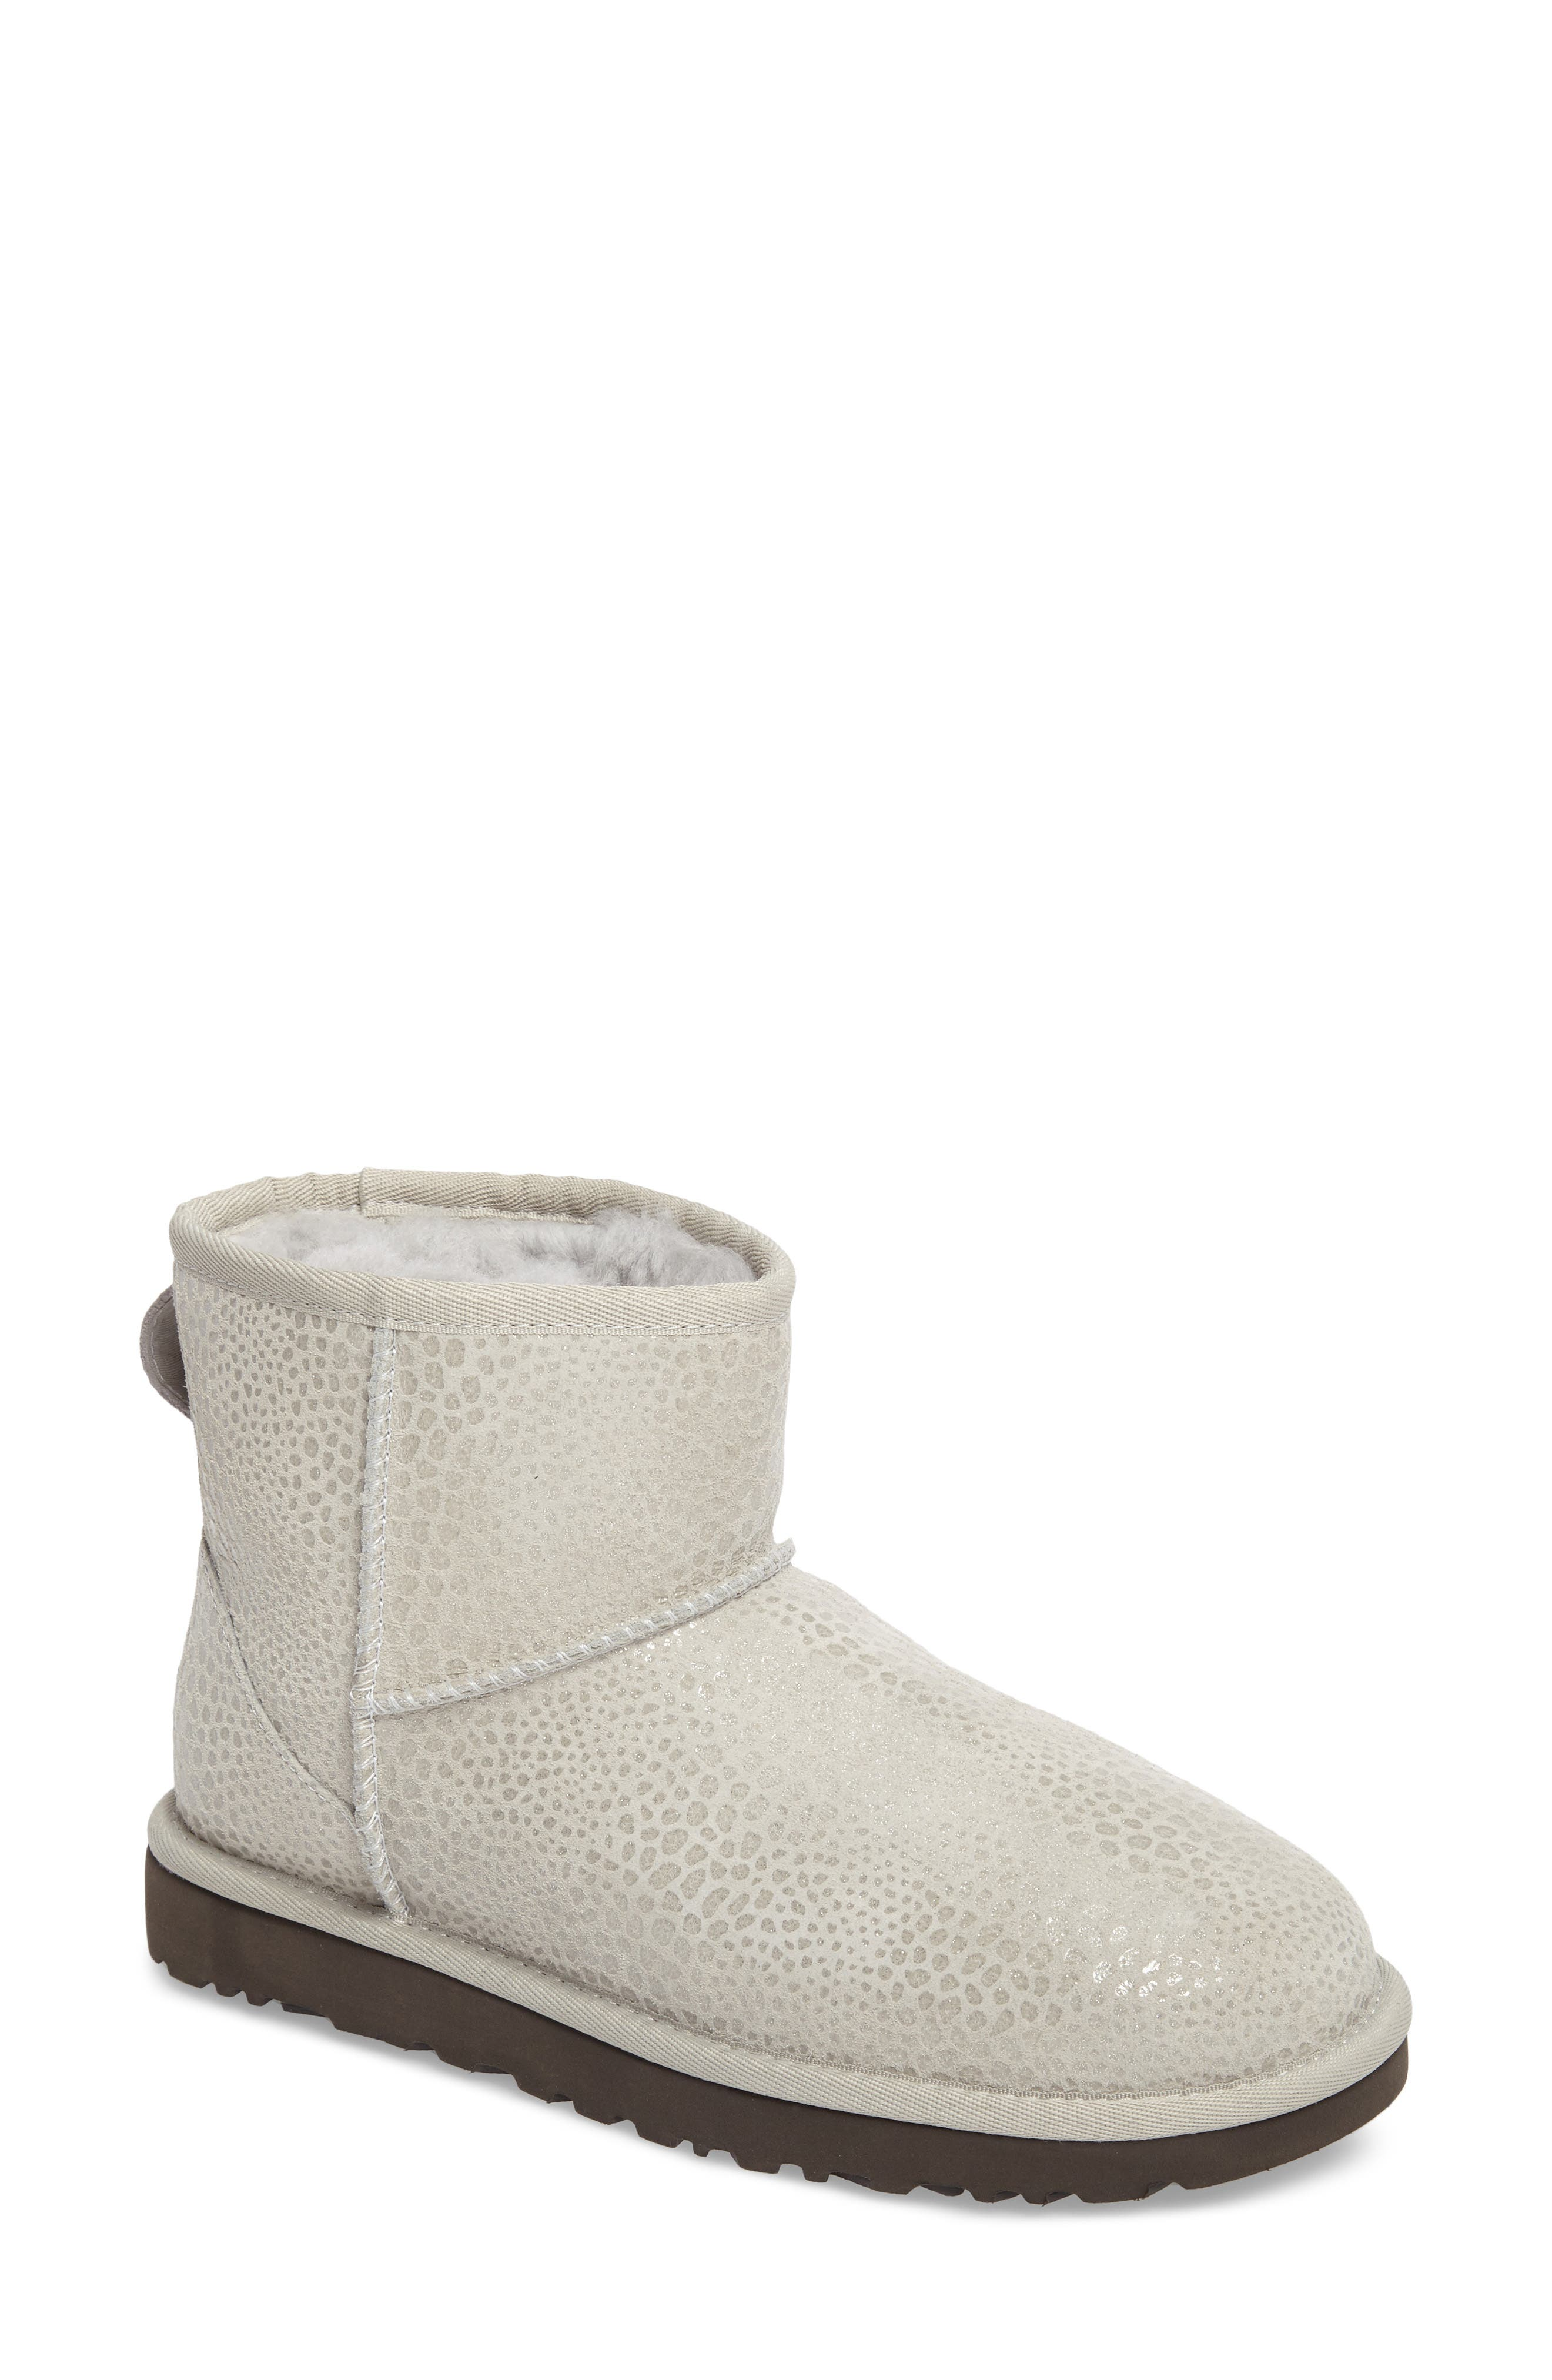 Alternate Image 1 Selected - UGG® Mini Glitzy Boot (Women)